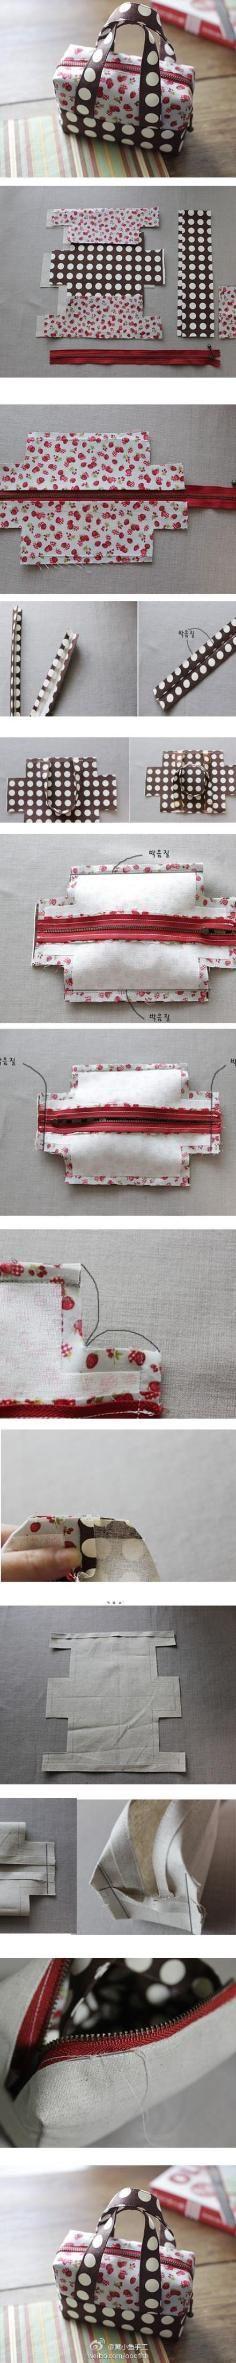 Cute bag found at http://www.beadandcord.com/clipper/martha.lawson.1369114/diy-accessories-9750/36834.html